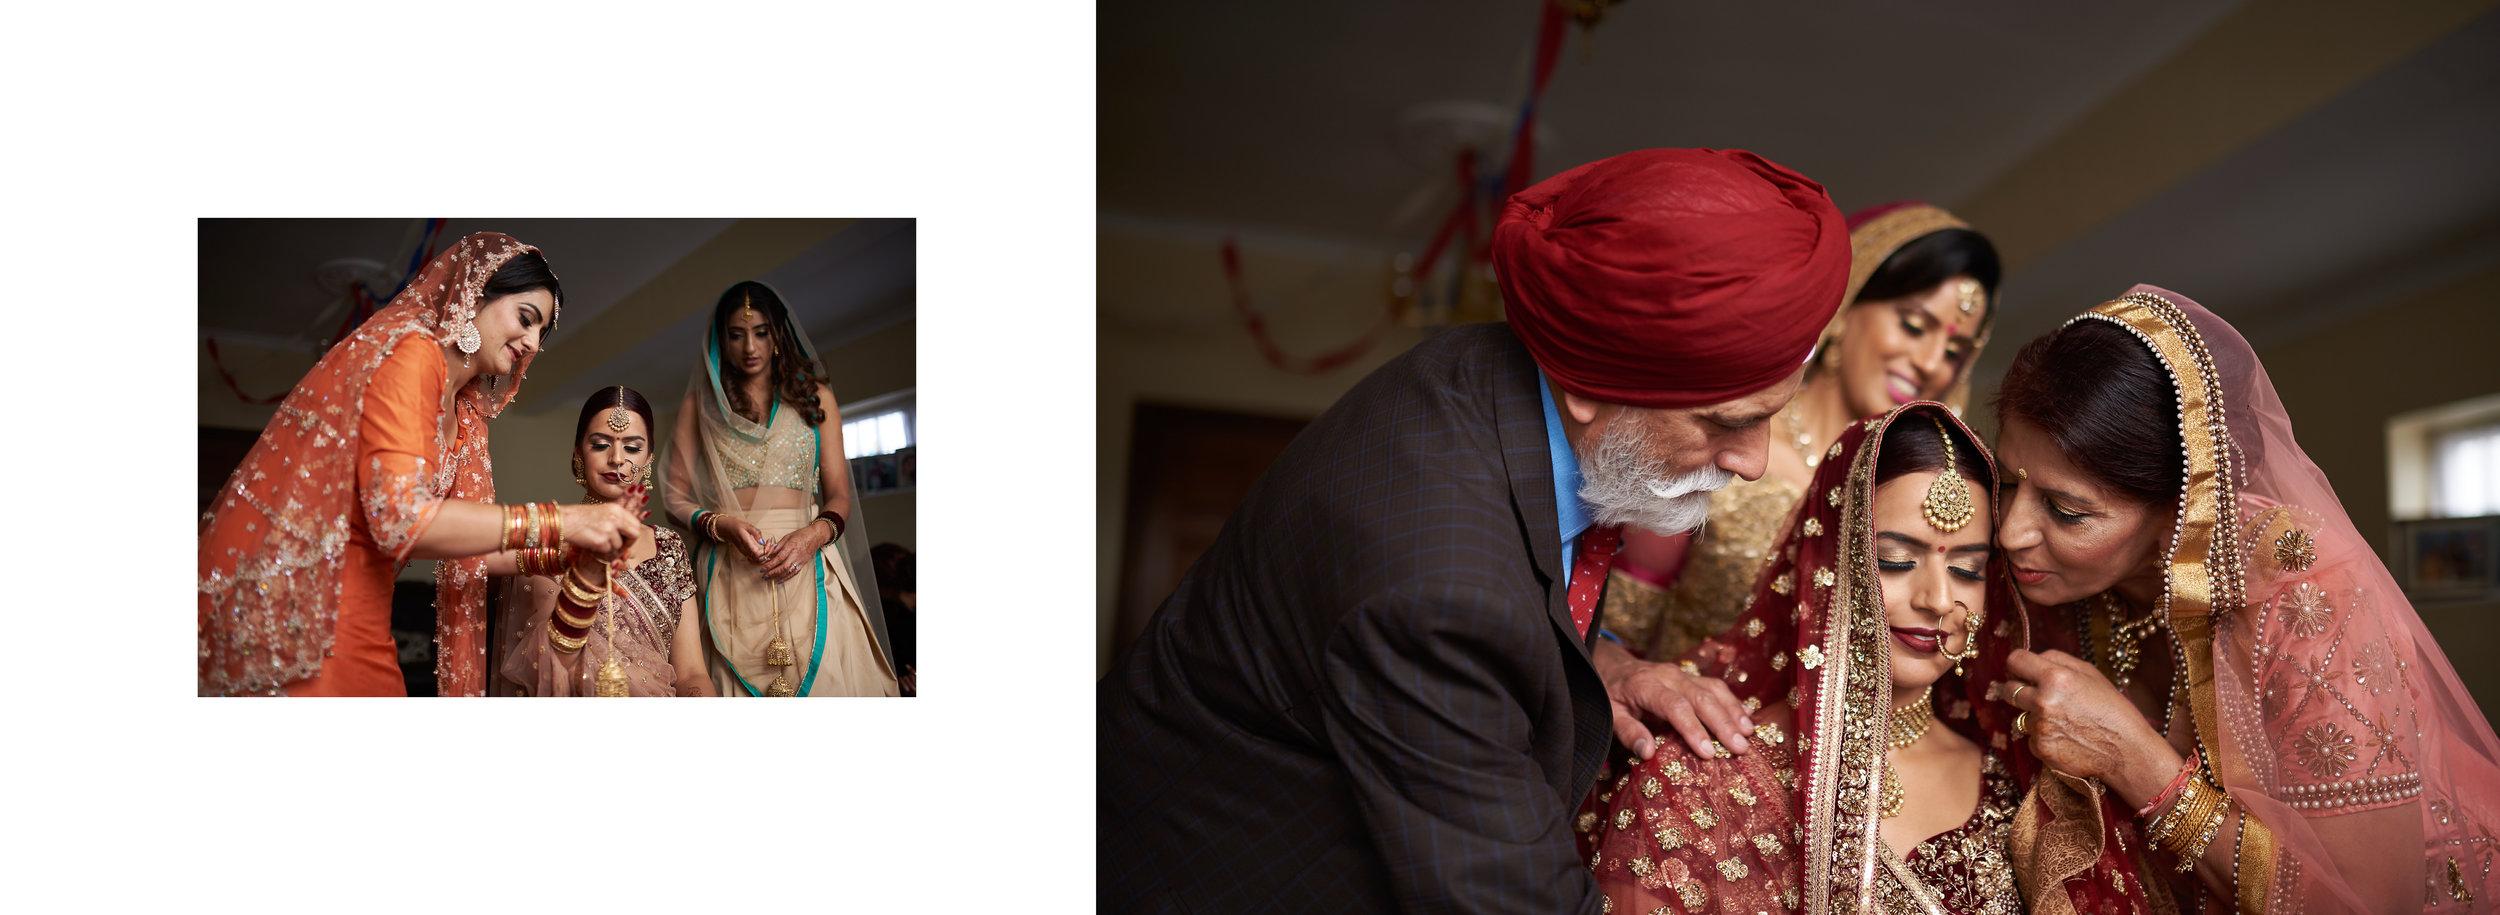 Sikh Wedding Album spread 9 - brides family putting chunni on